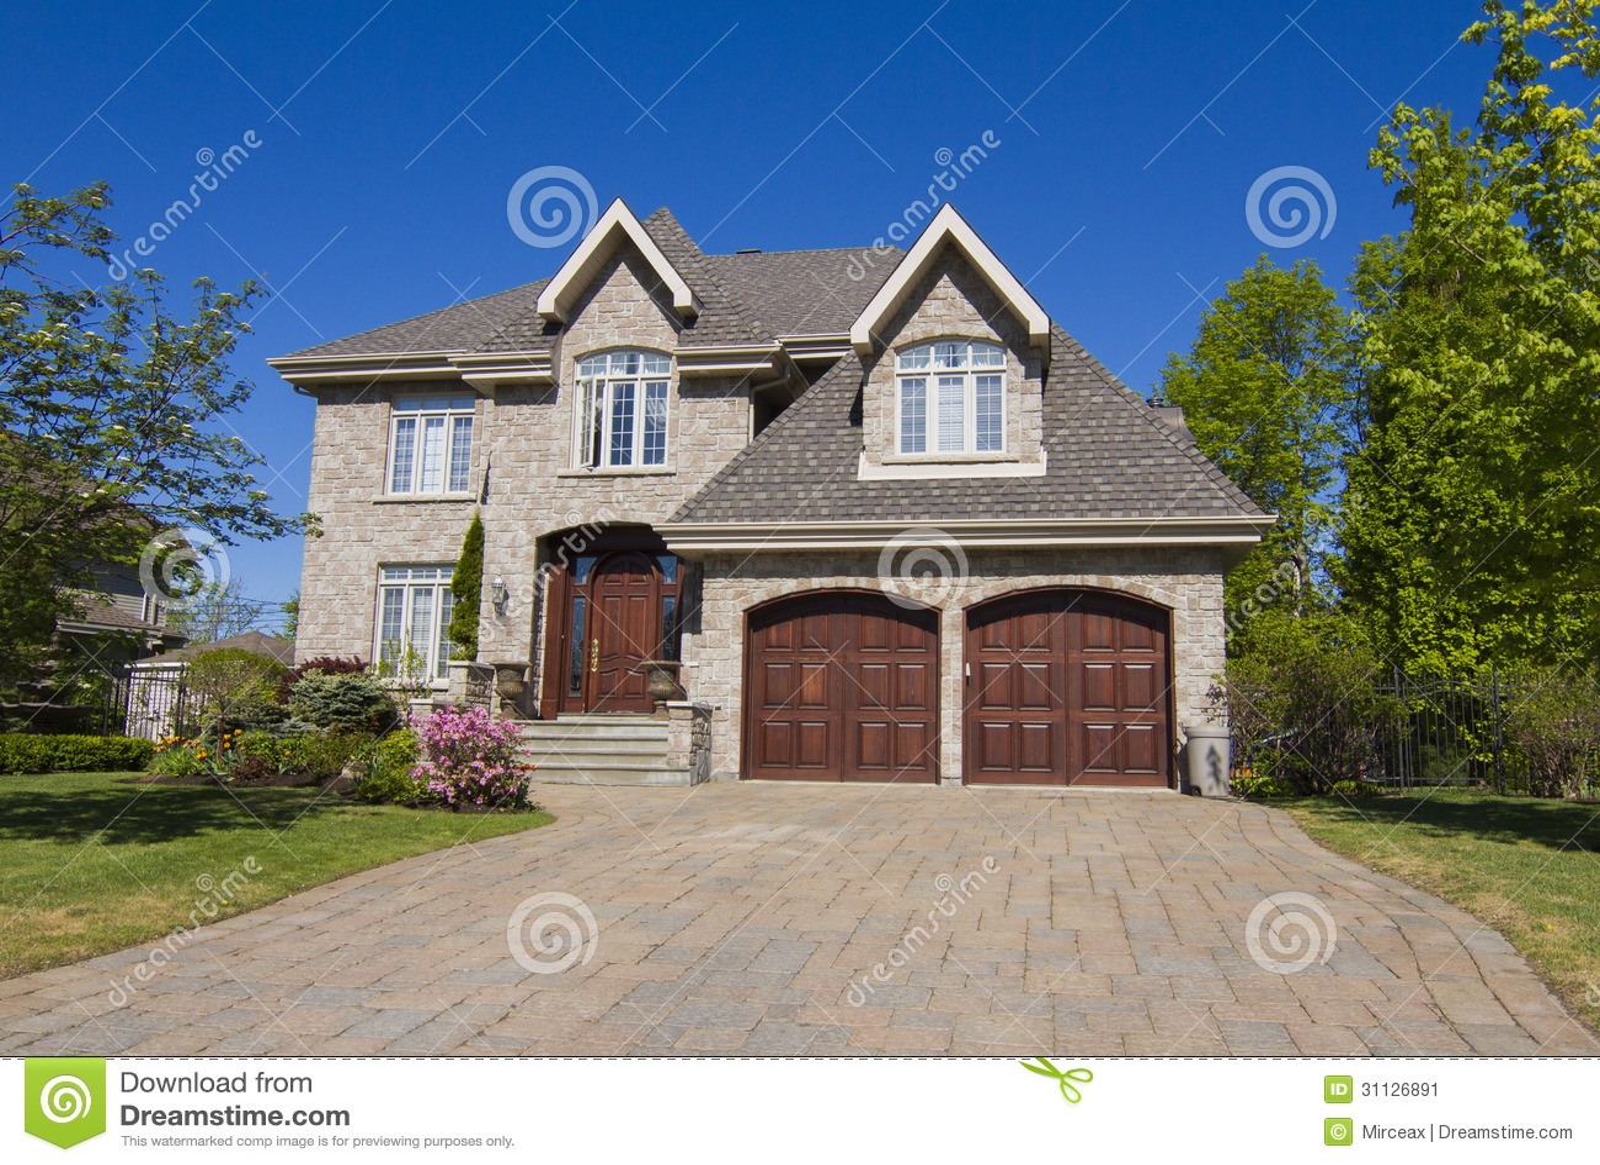 Big House Stock Image Image 31126891